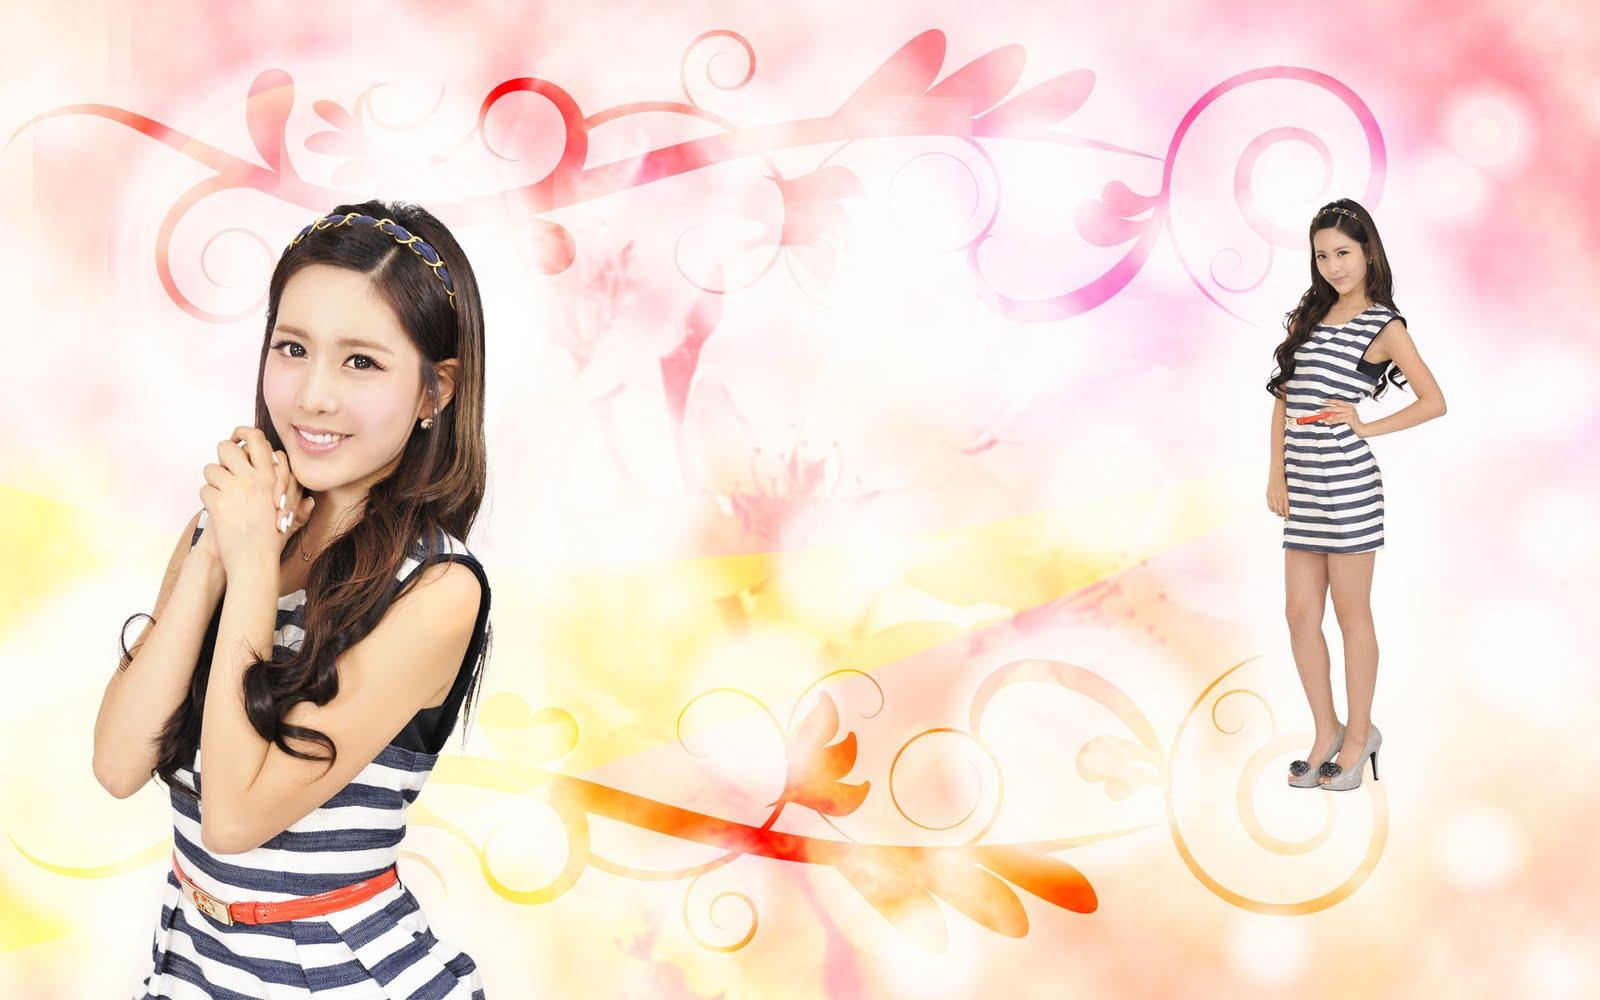 http://4.bp.blogspot.com/-JJPm6aQxluE/Tl8F60gXXcI/AAAAAAAAEkM/EAPV44VyvMM/s1600/t-ara+official+japan+pictures+%25284%2529.jpg